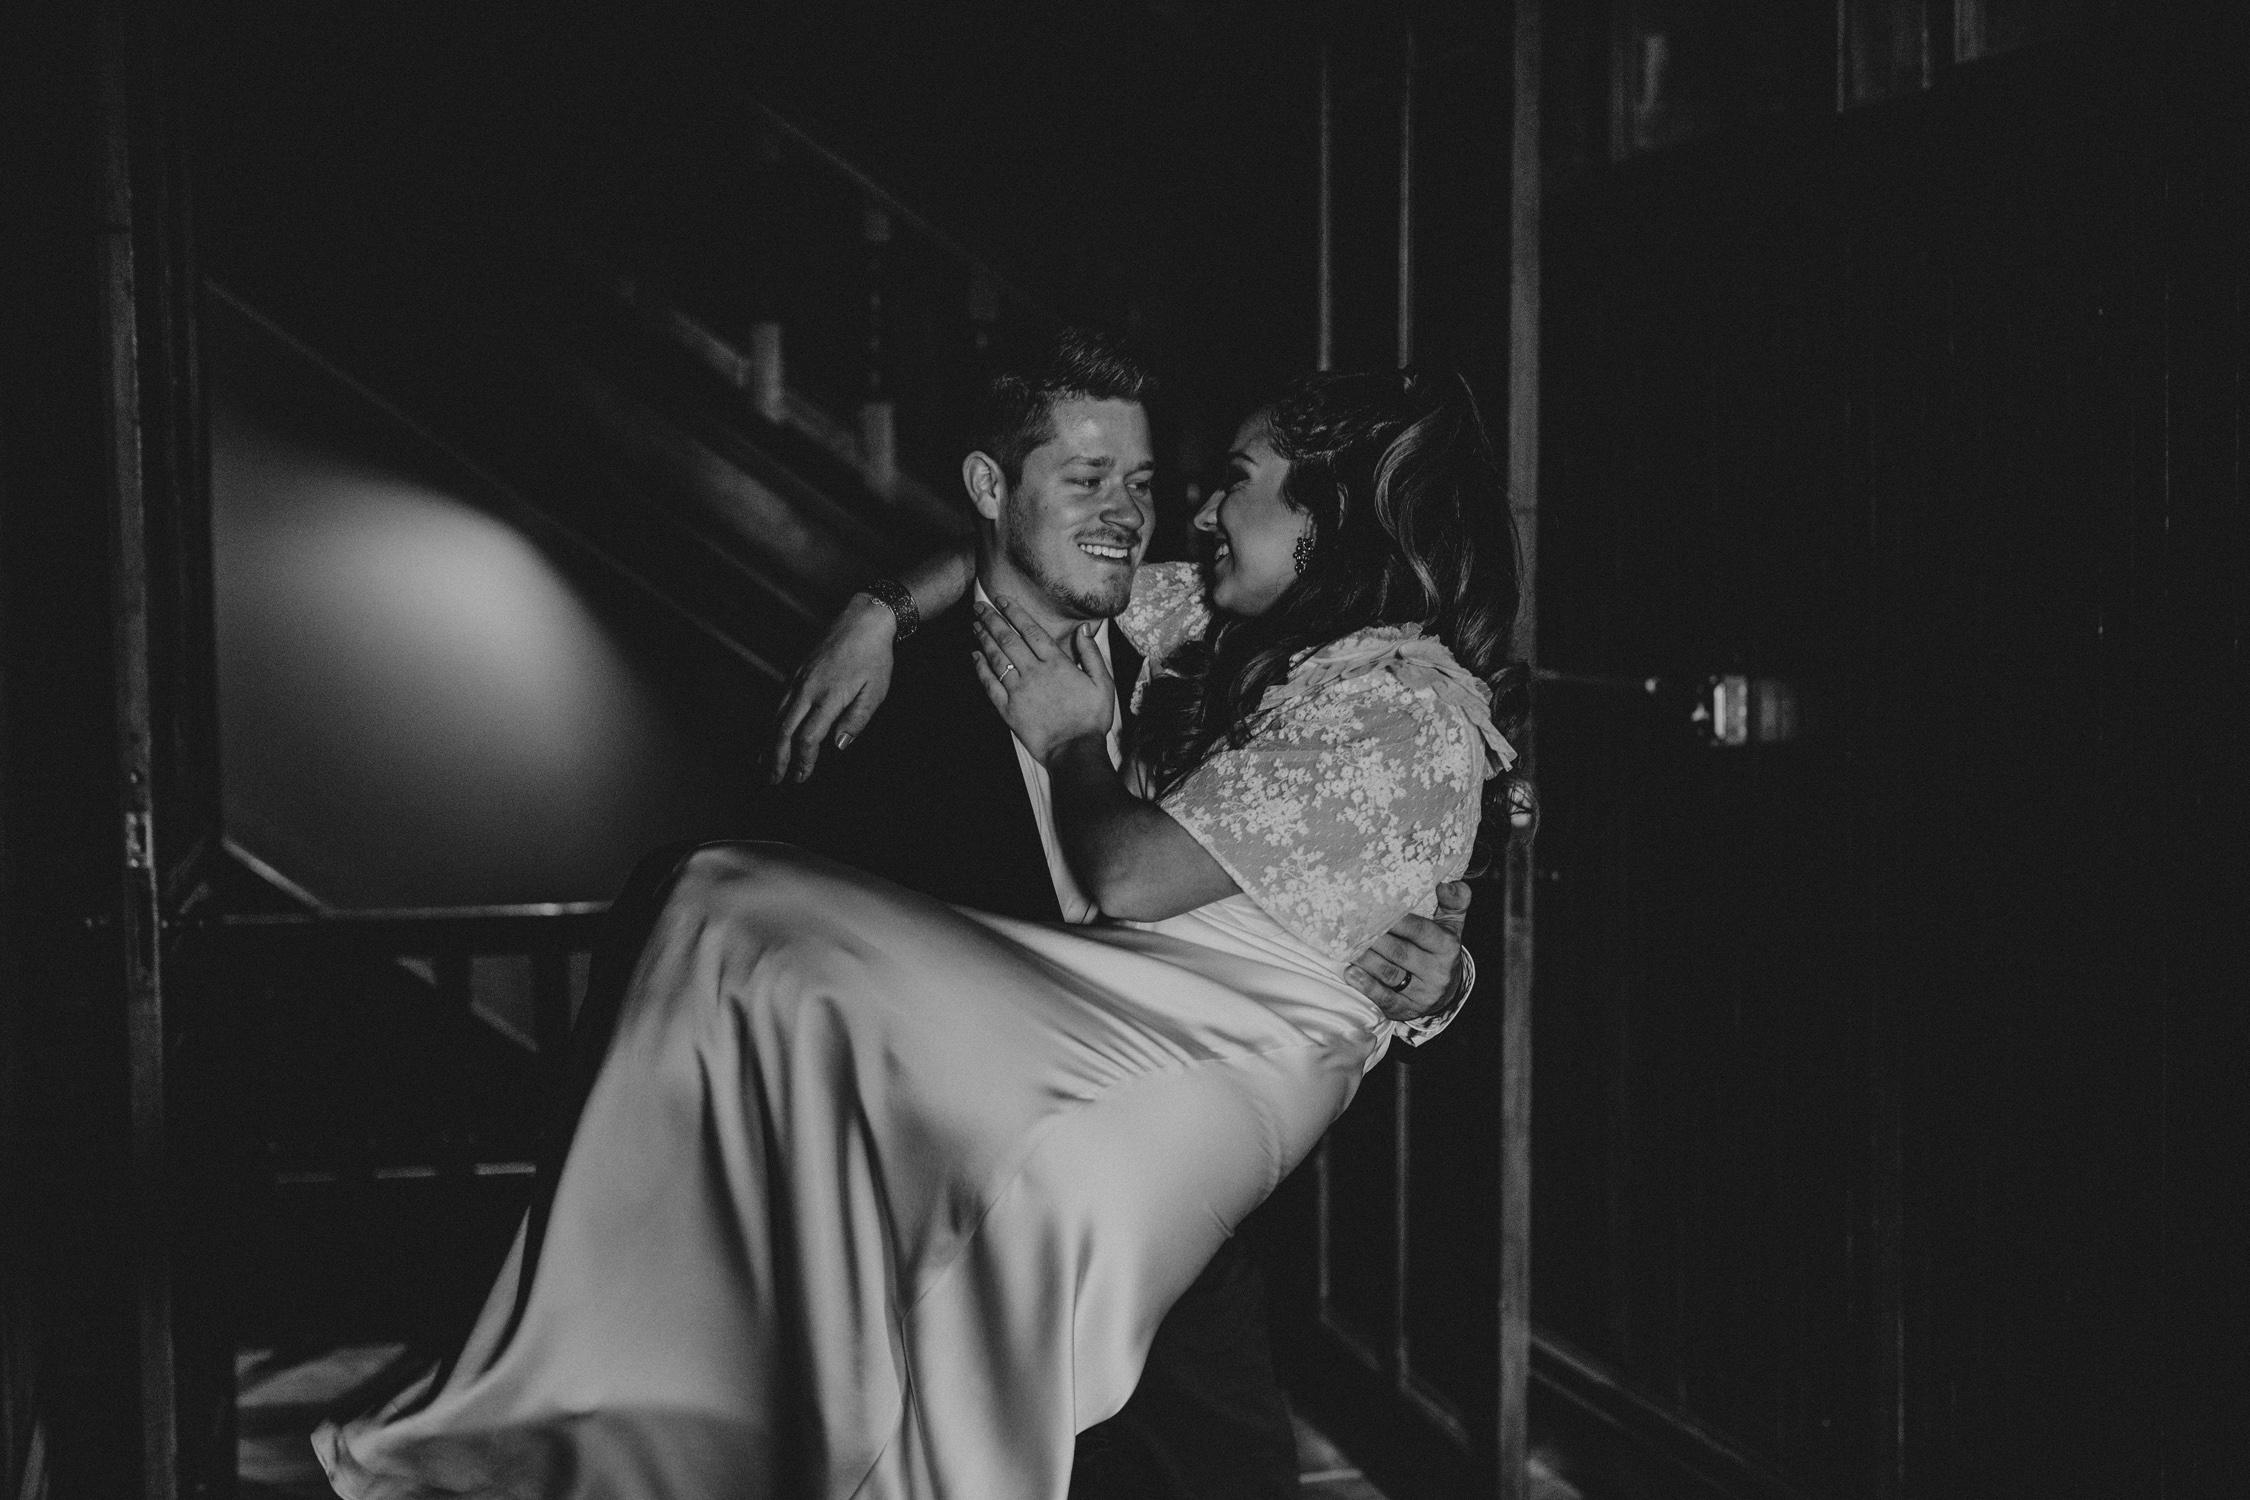 albany_wedding_boudoir_014.JPG